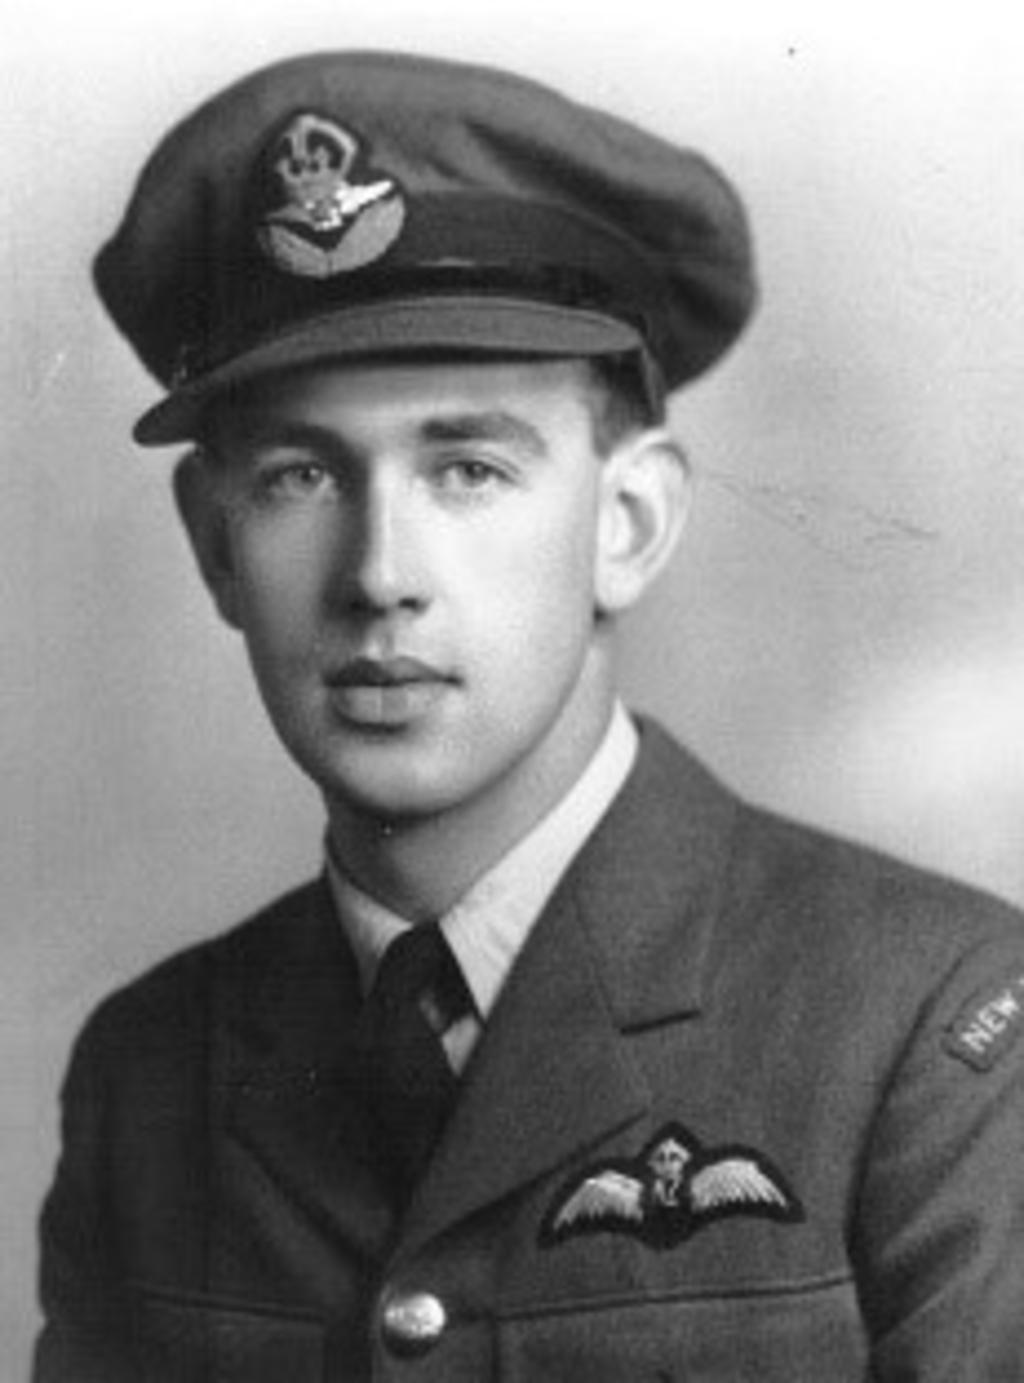 <p>Jack Lunn</p> <p>Sky of Hope Vliegeniersmuseum</p> © BDU Media